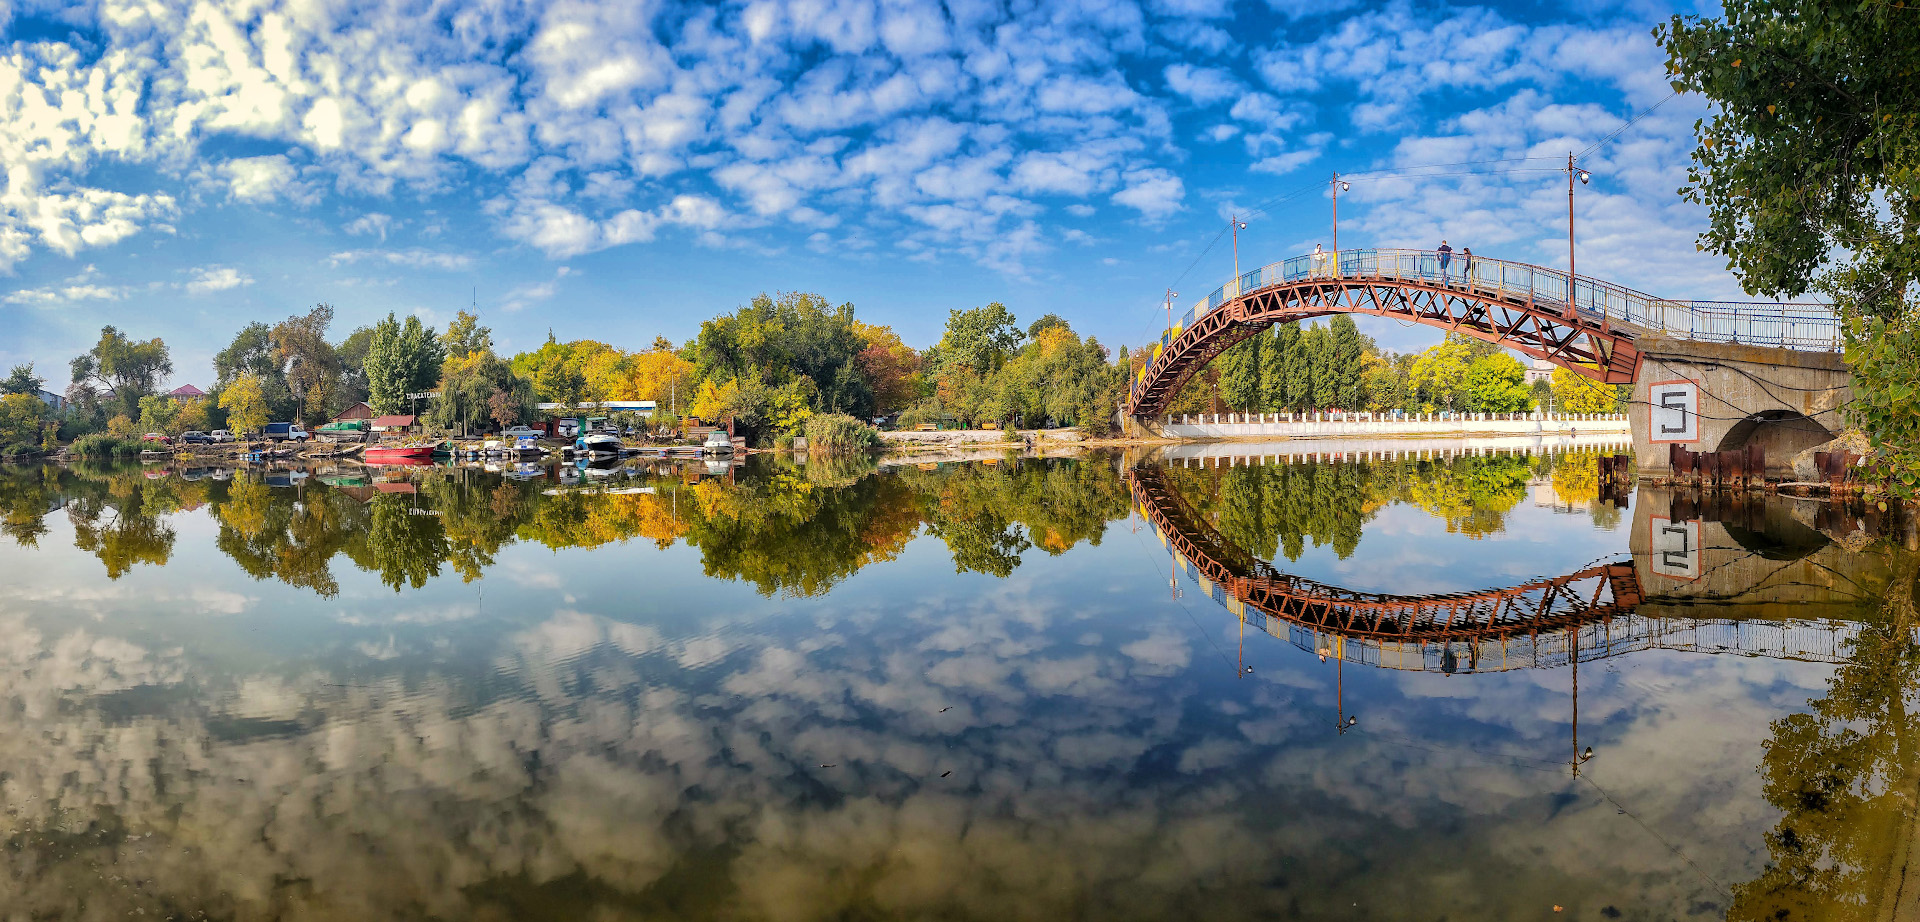 Горбатый Мост, октябрь 2019